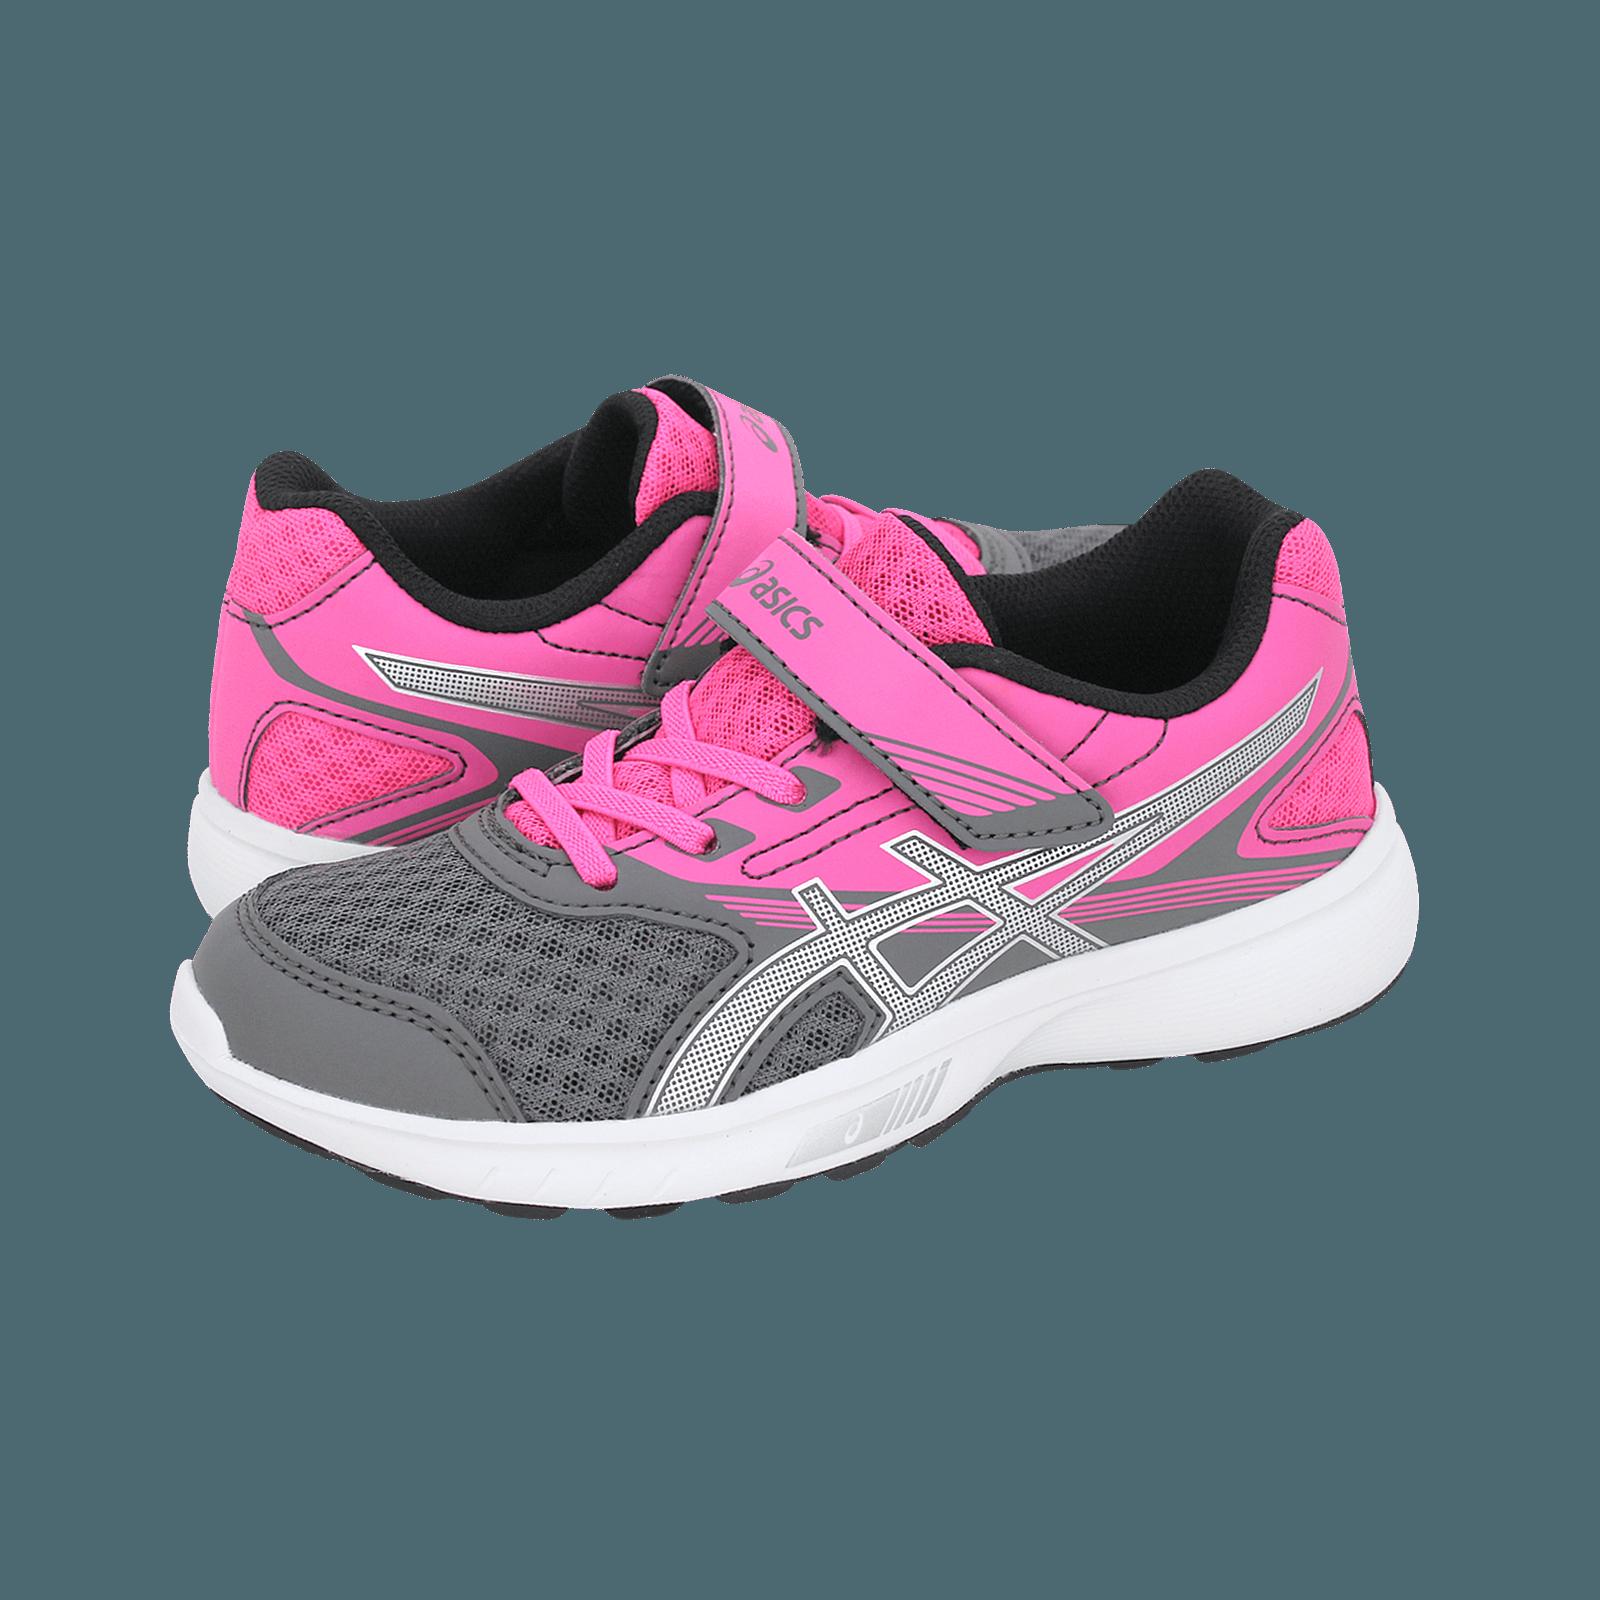 b85f5d55c58 Αθλητικά Παιδικά Παπούτσια Asics Stormer PS - Glami.gr